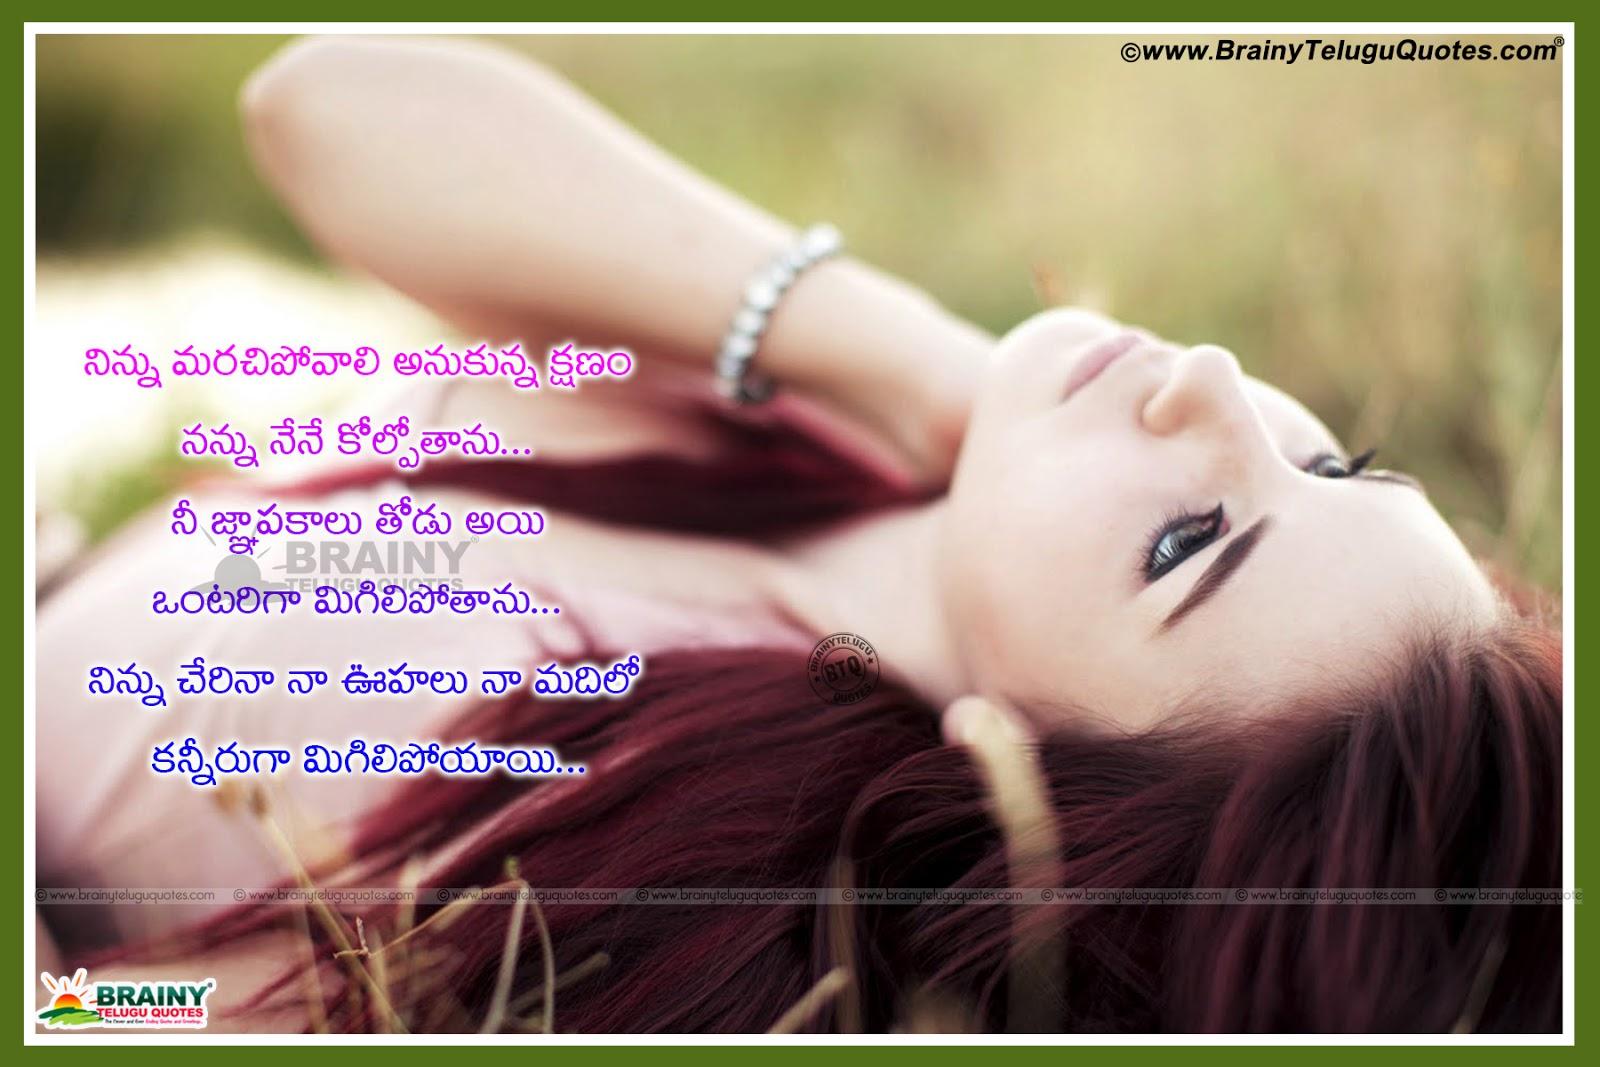 sad alone love quotes in telugu telugu prema kavithalu